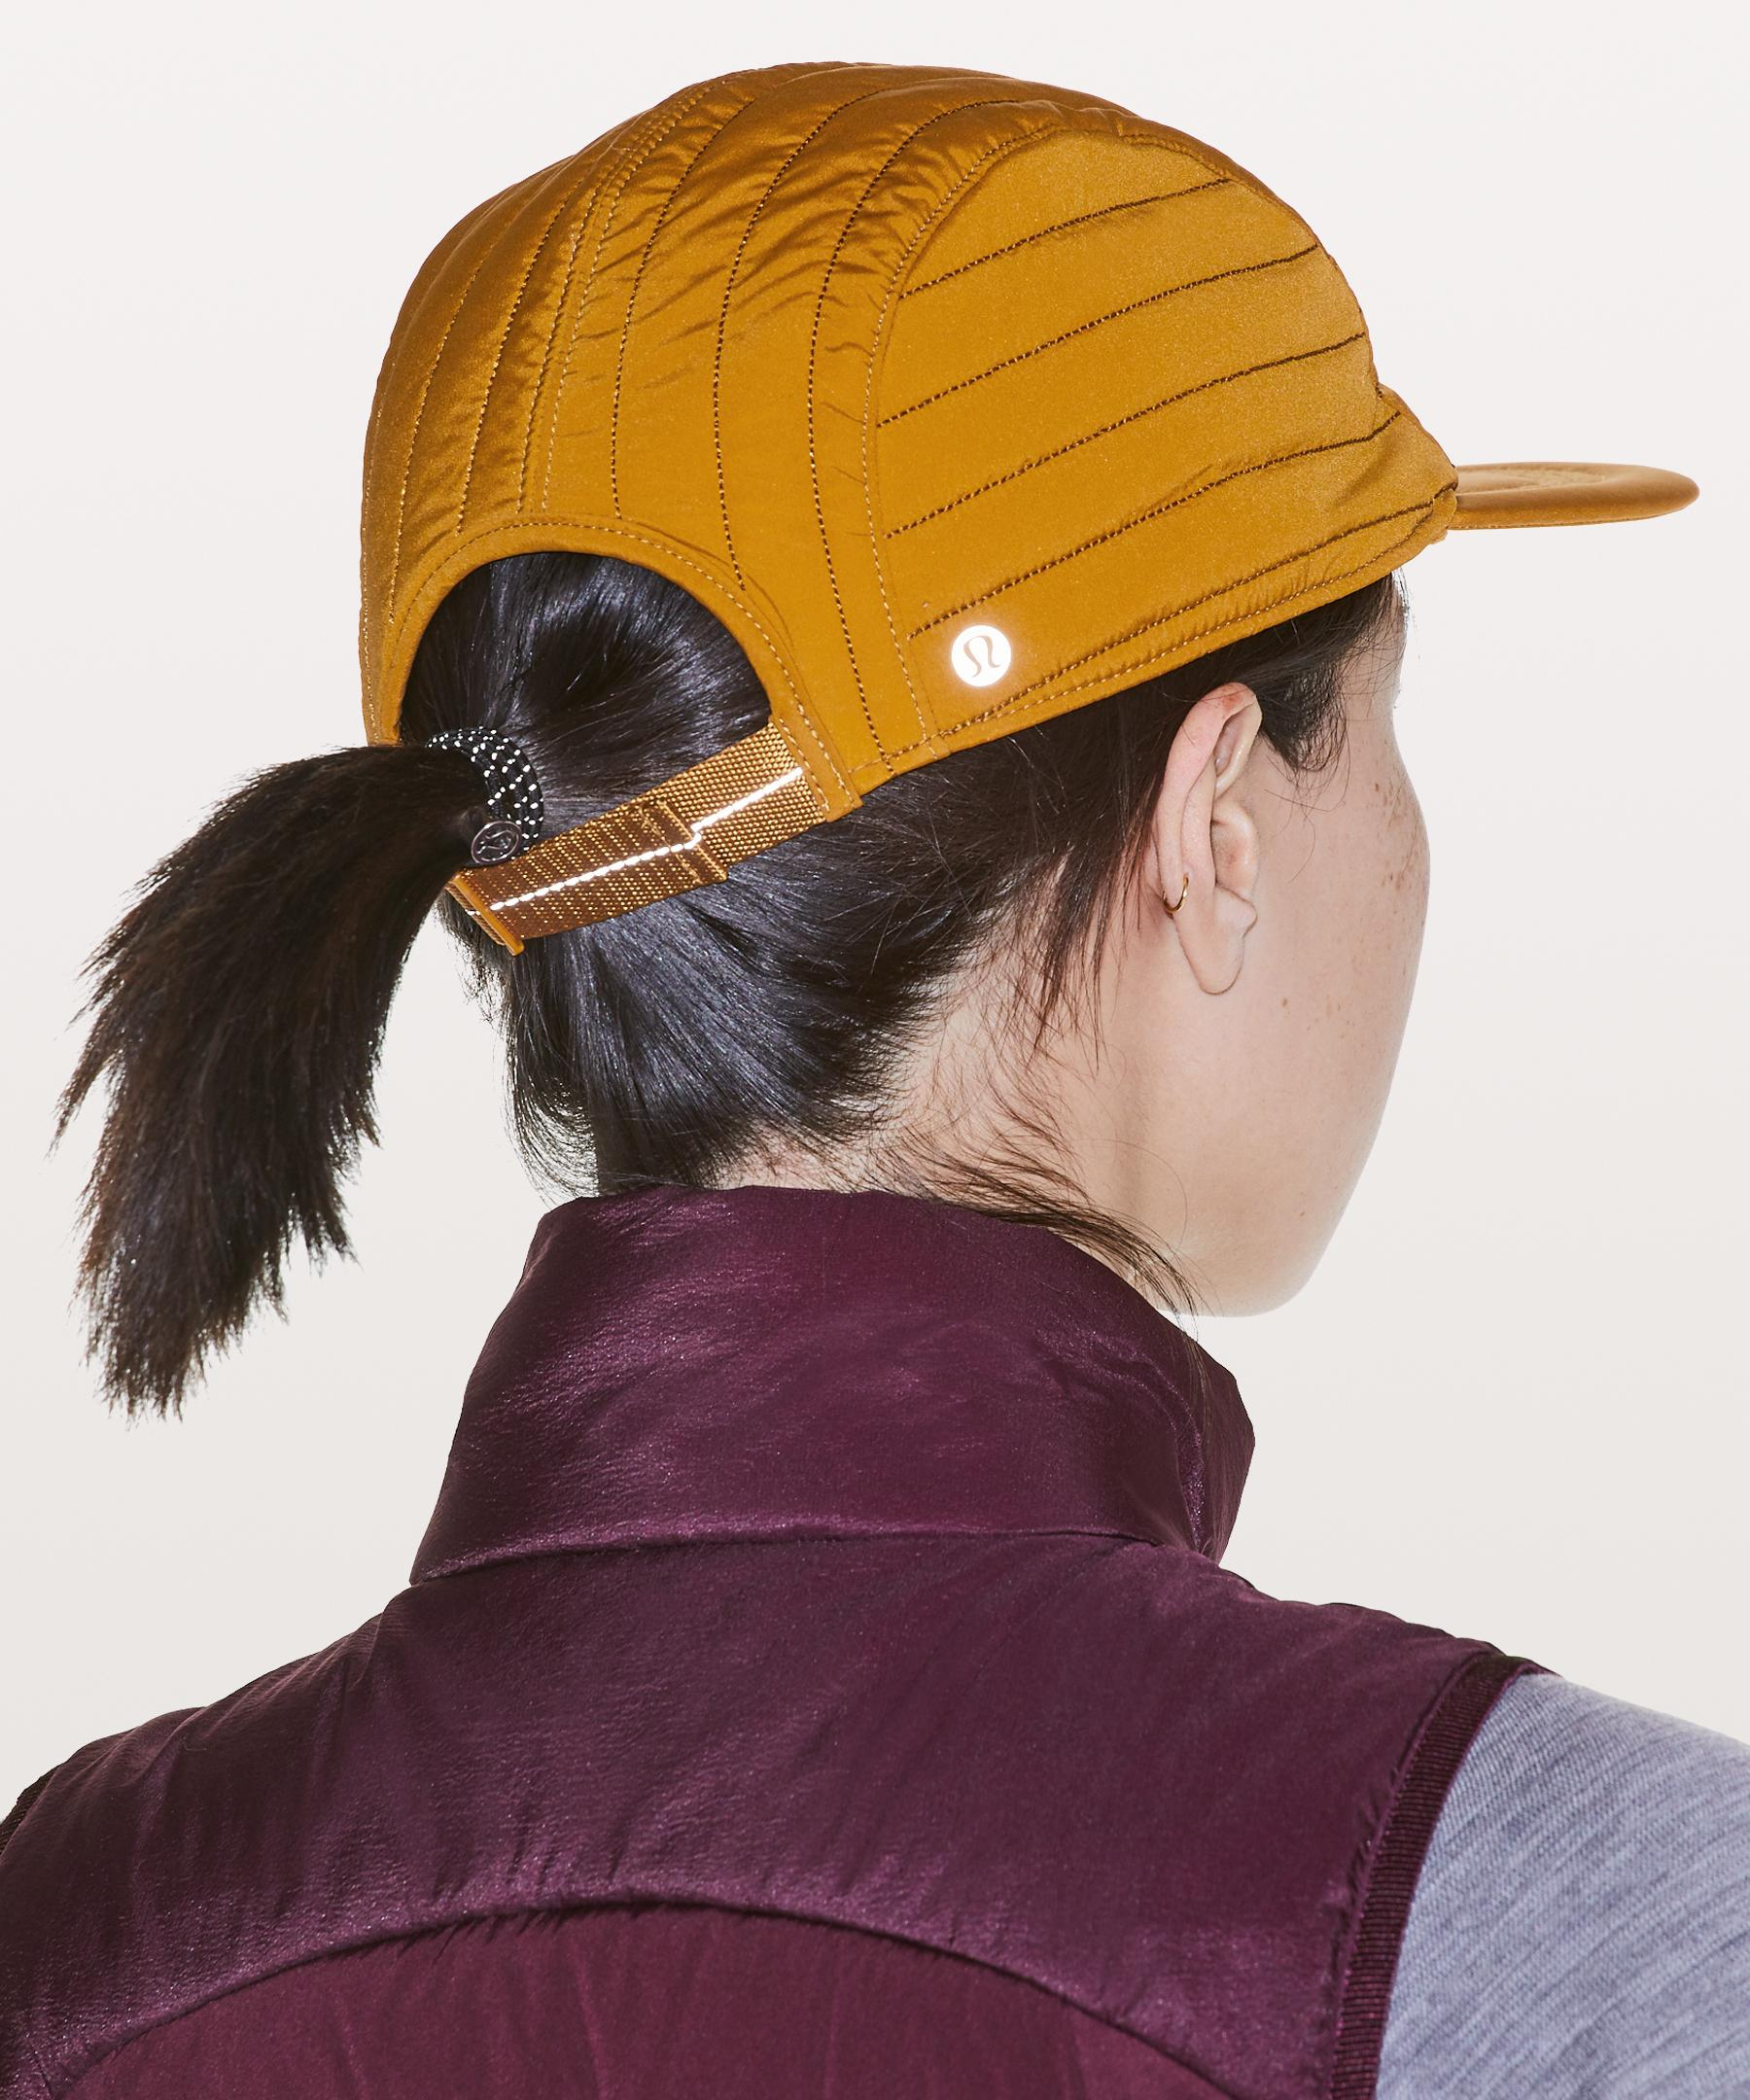 Lyst - lululemon athletica Pinnacle Warmth Hat - Save 50% b317be9f2beb